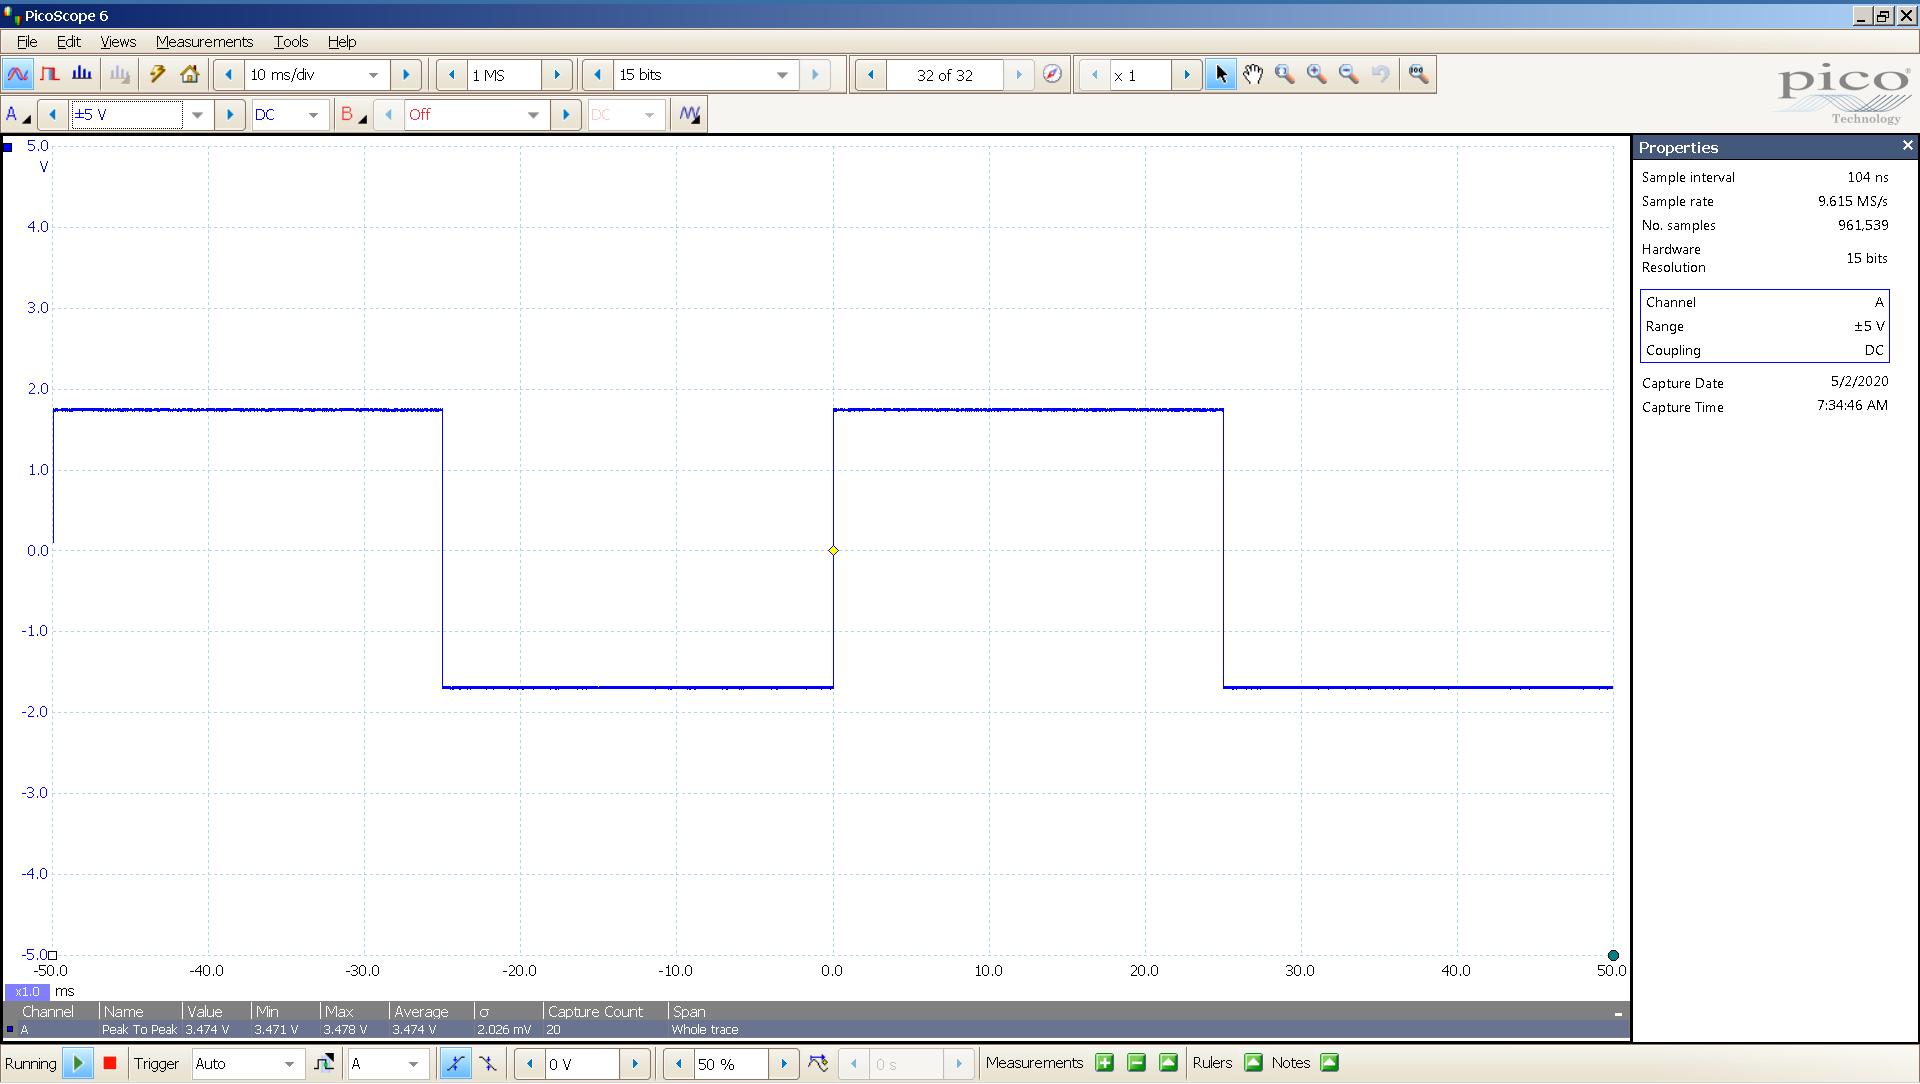 20200502-01 KTE Spring2 20 Hz sqr -4 dBFS 4 Vpp 10mS div SE - ASIO - NOS.png